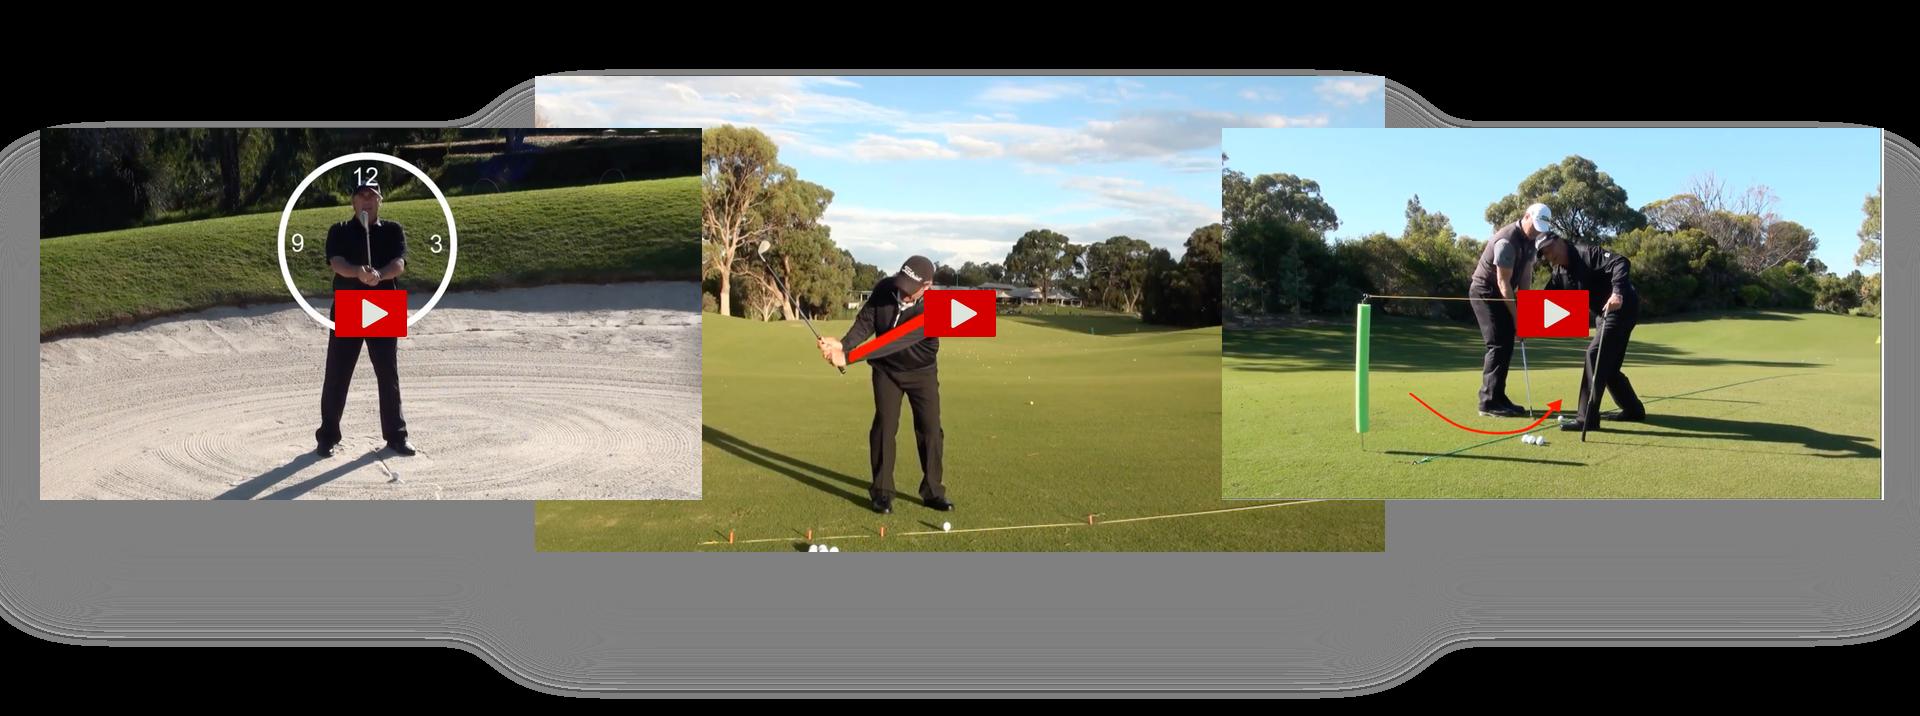 Elite Golfer Improvement System game improvement videos